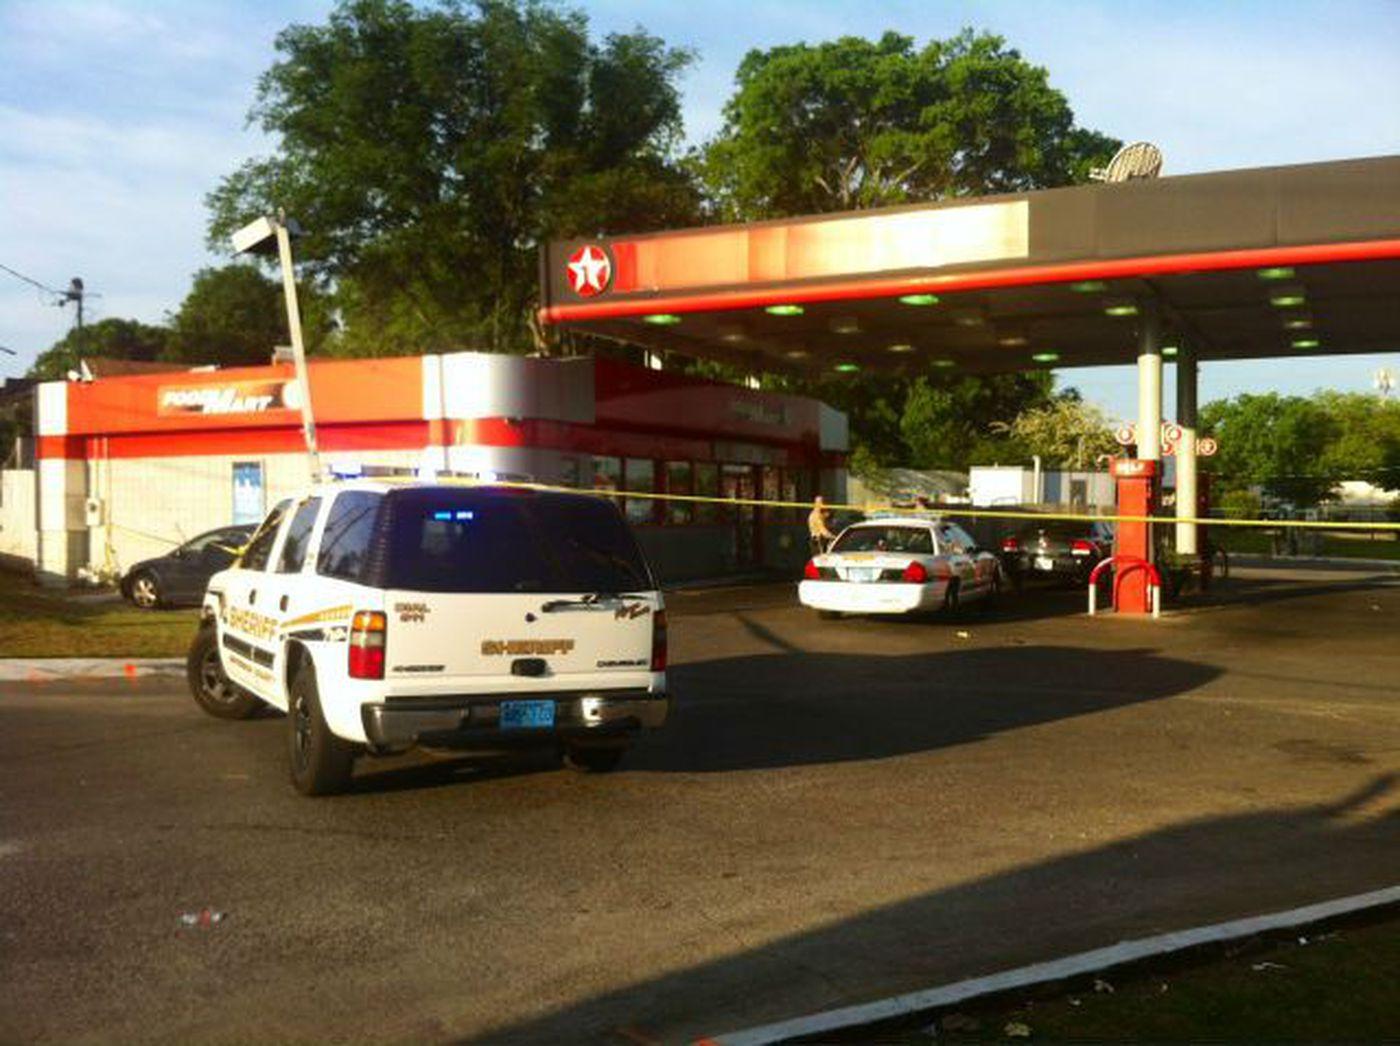 Texaco station raid part of national drug operation